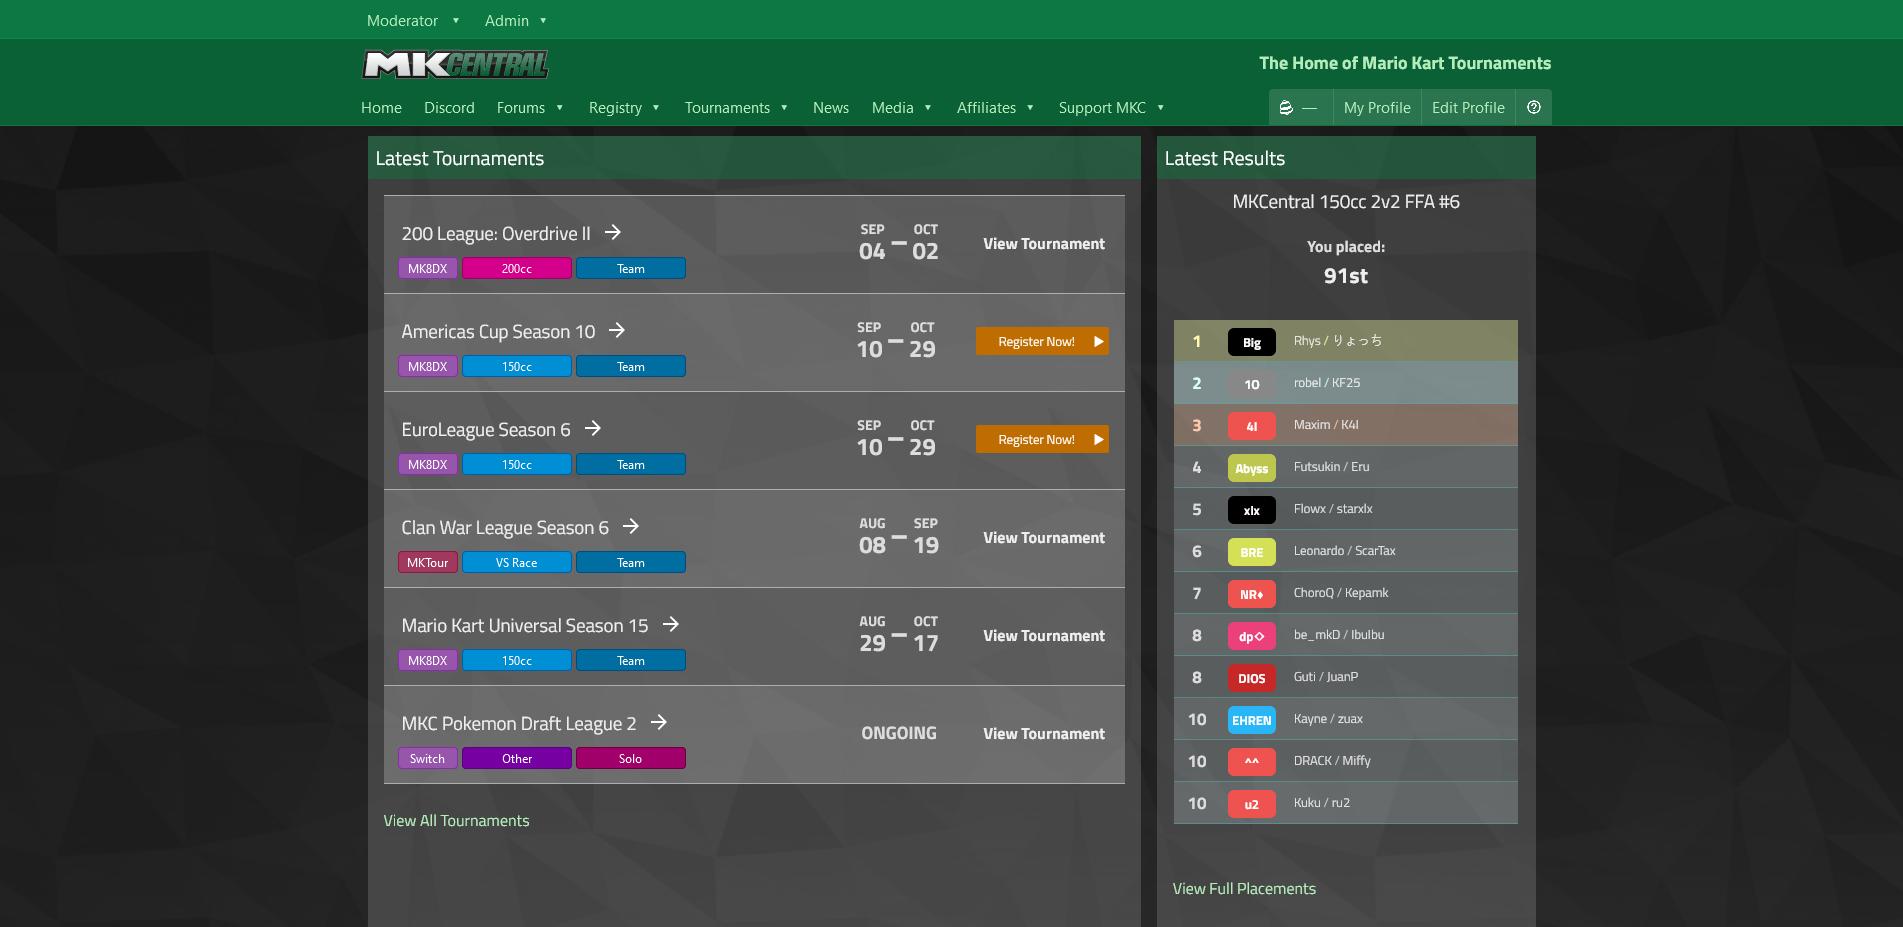 Screenshot-2021-09-01-at-22-46-49-Mario-Kart-Central-Mario-Kart-Tournaments-Community-and-Forums.png